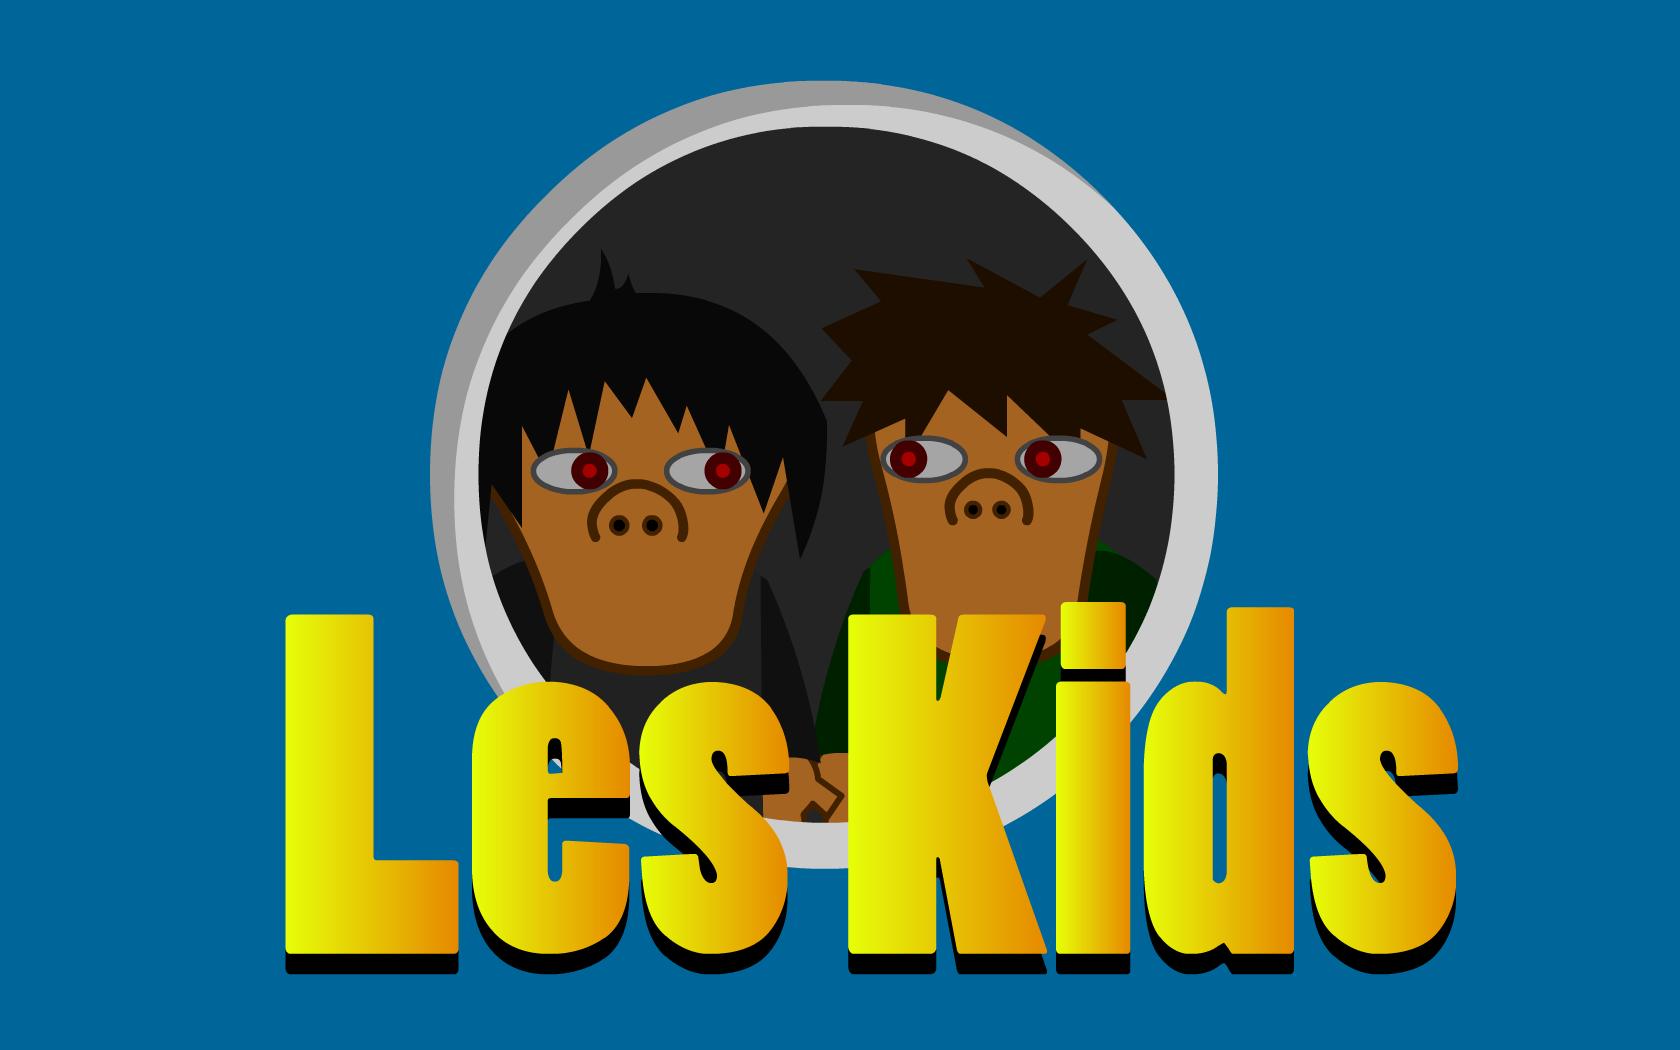 Les Kids (WallPaper) Blue